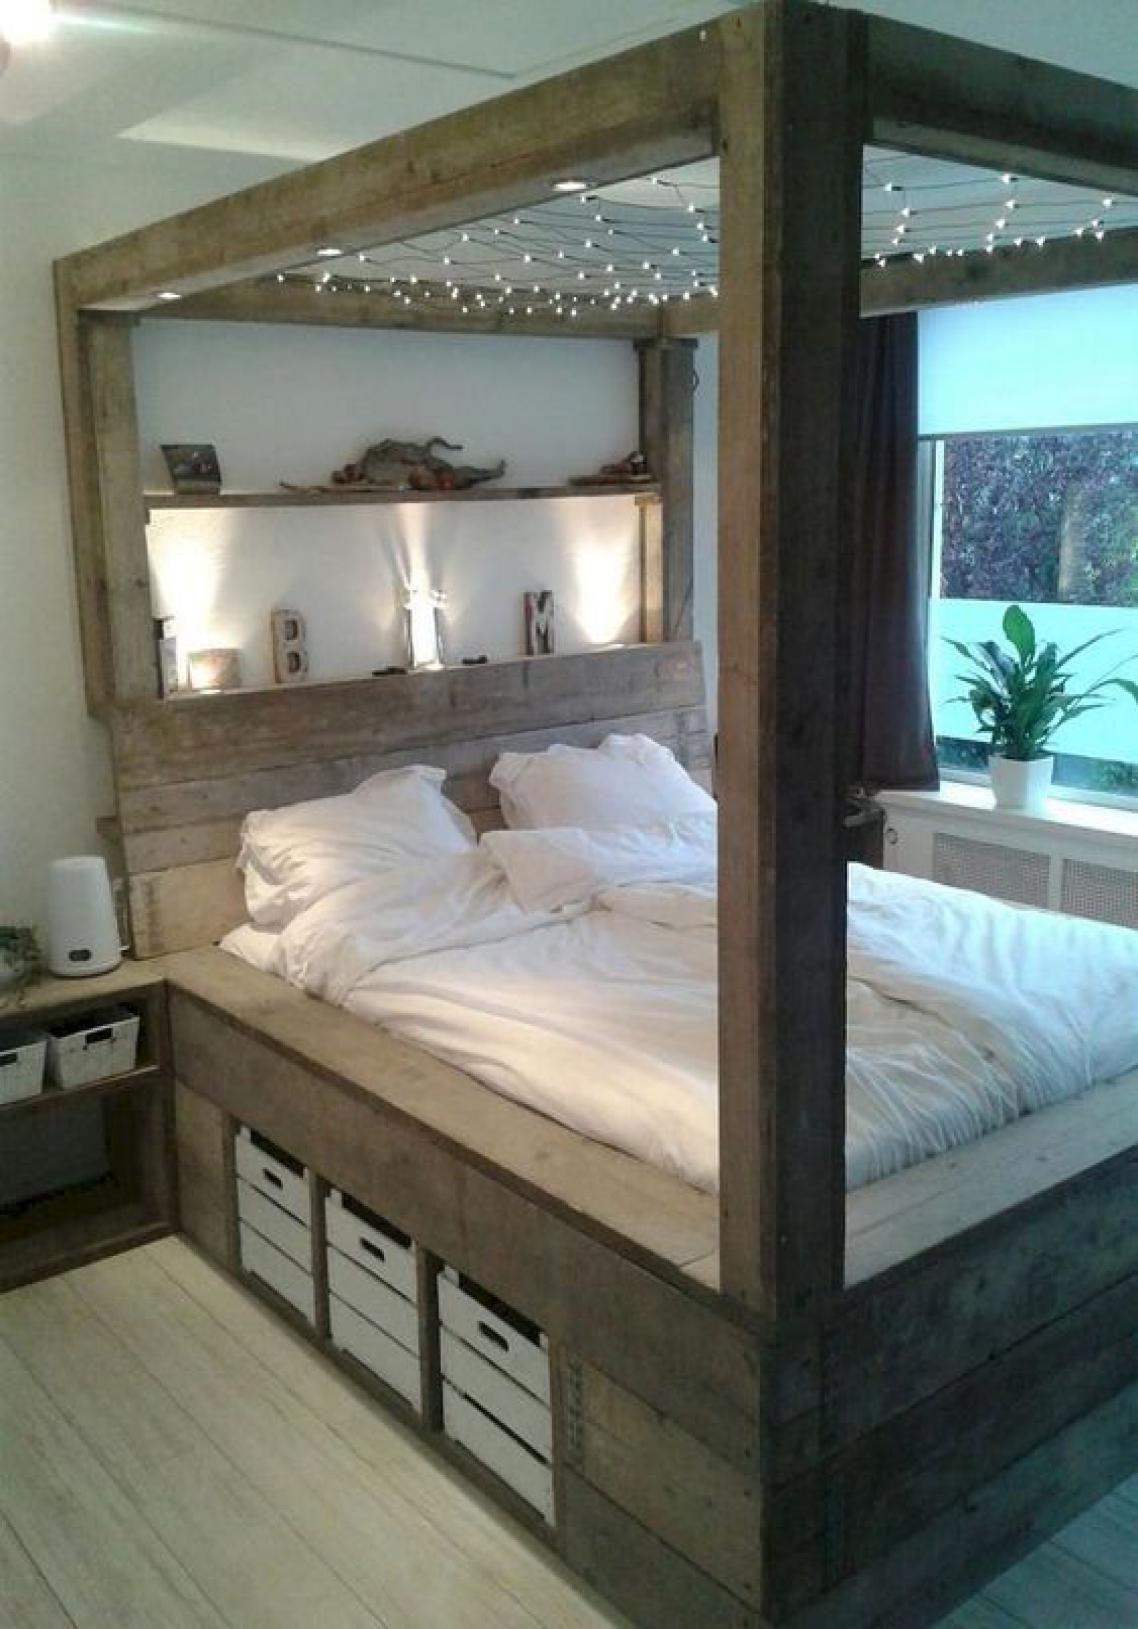 Elegant Romantic Bedrooms: 48 Elegant Modern Farmhouse Style Bedroom Decor Ideas In